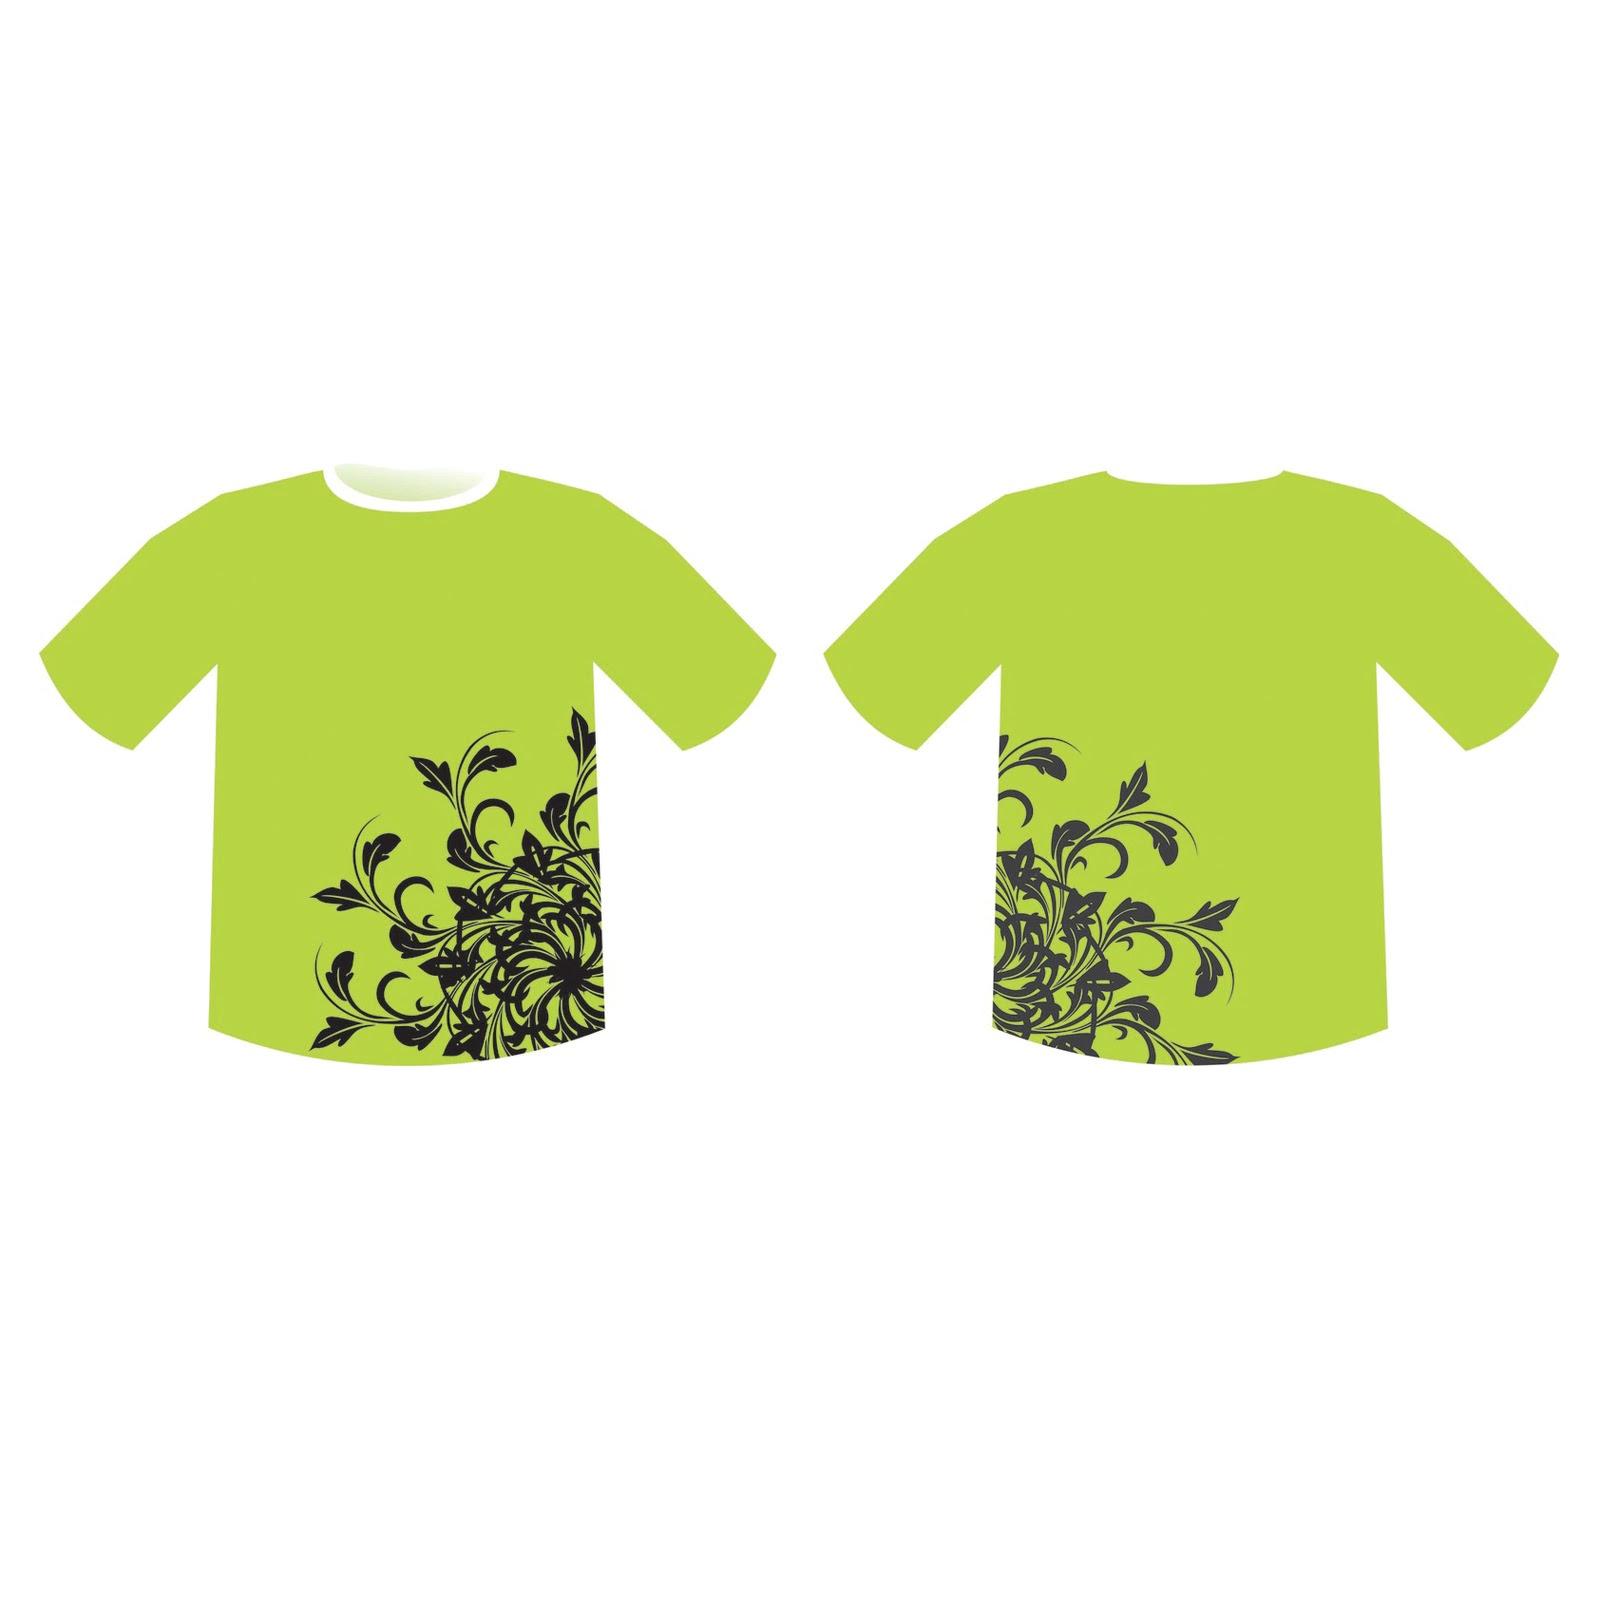 Batik Design: Design Of Batik T-Shirt